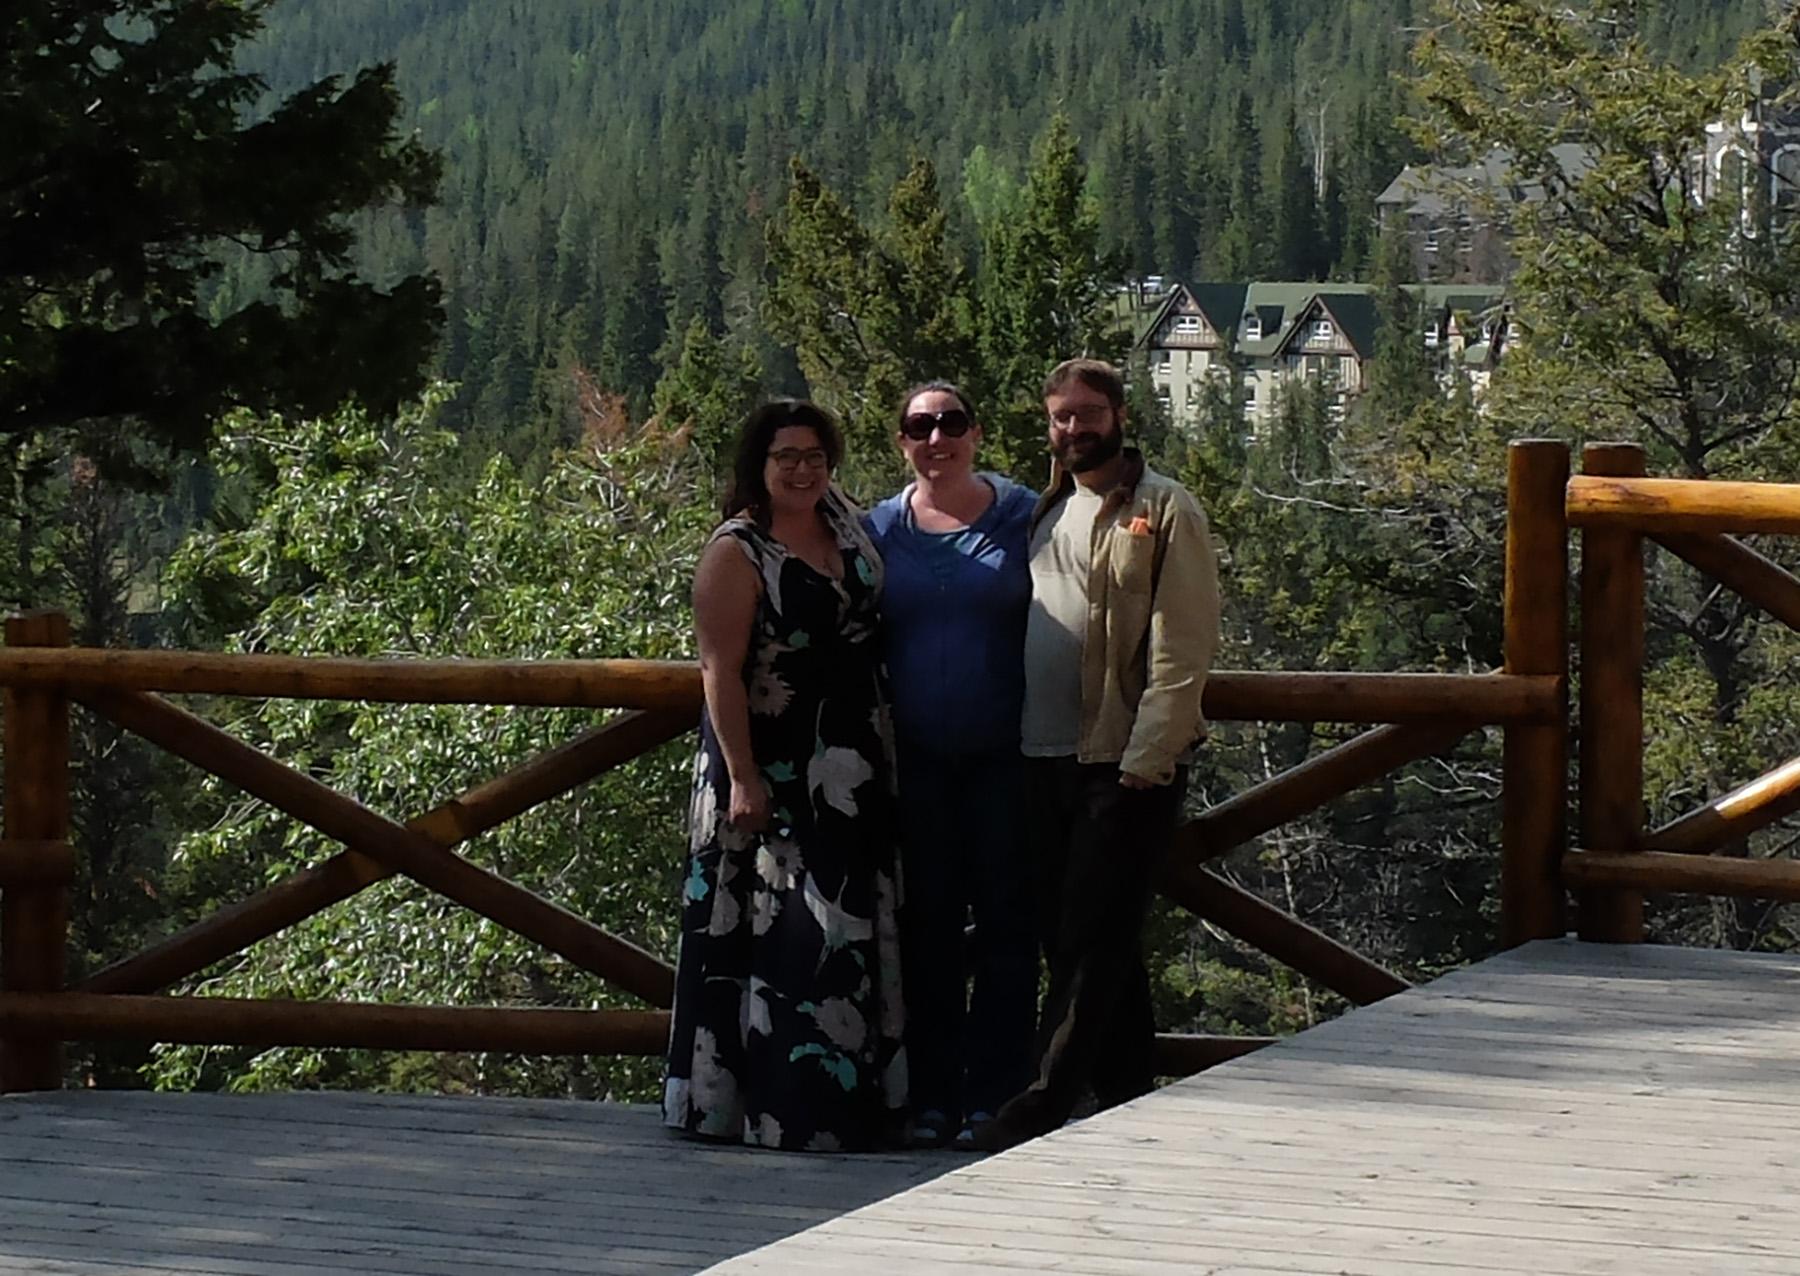 Niko, KJ, and I in front of the very impressive  Banff Springs Hotel